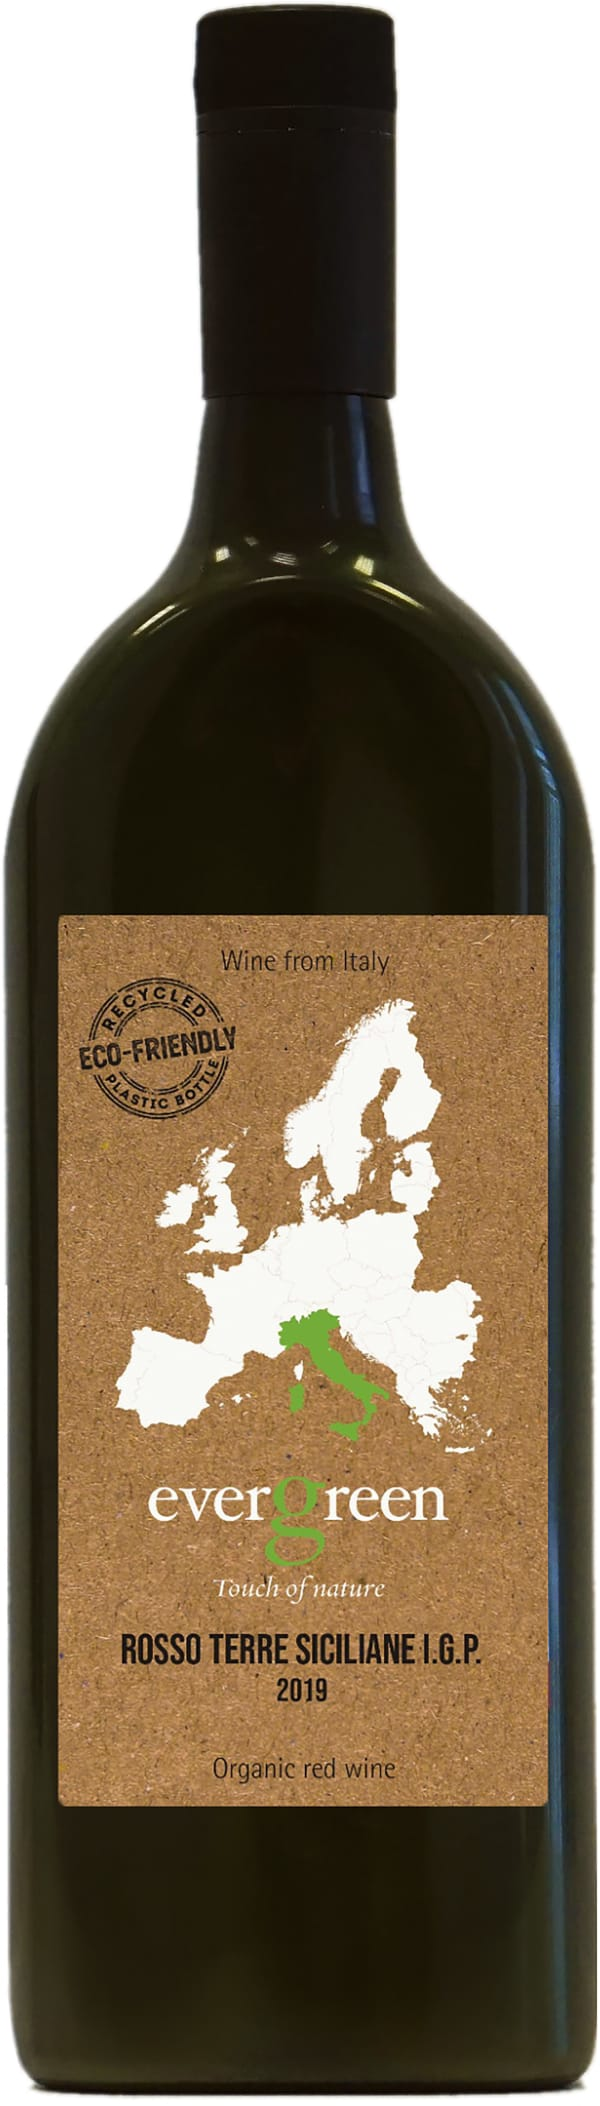 Evergreen Rosso Terre Siciliane 2019 plastic bottle